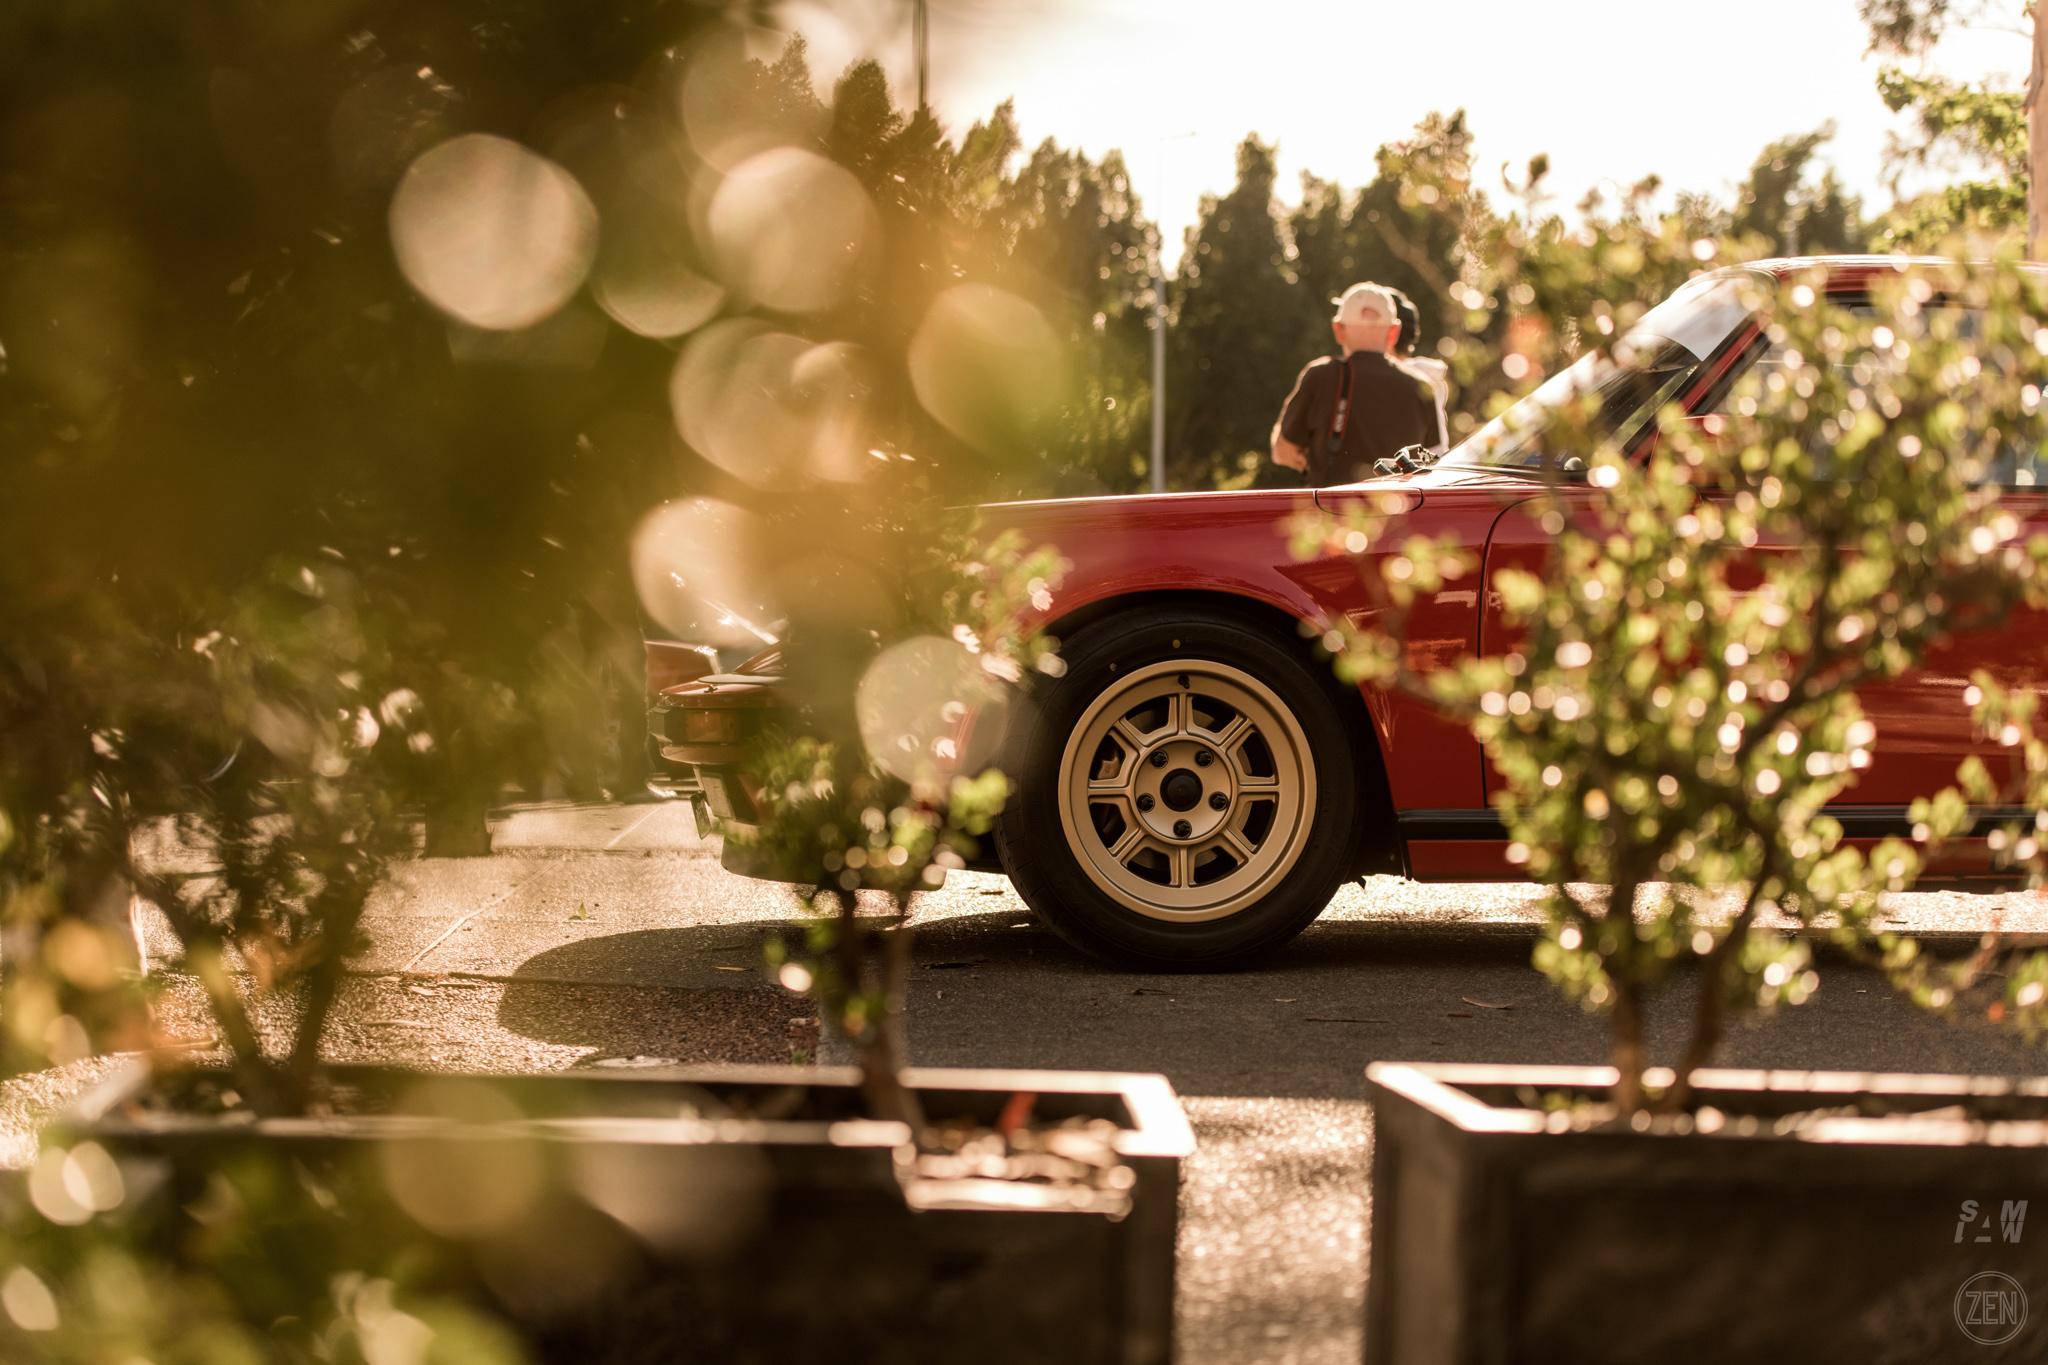 2019-10-27 - Autohaus Porsches & Coffee 125